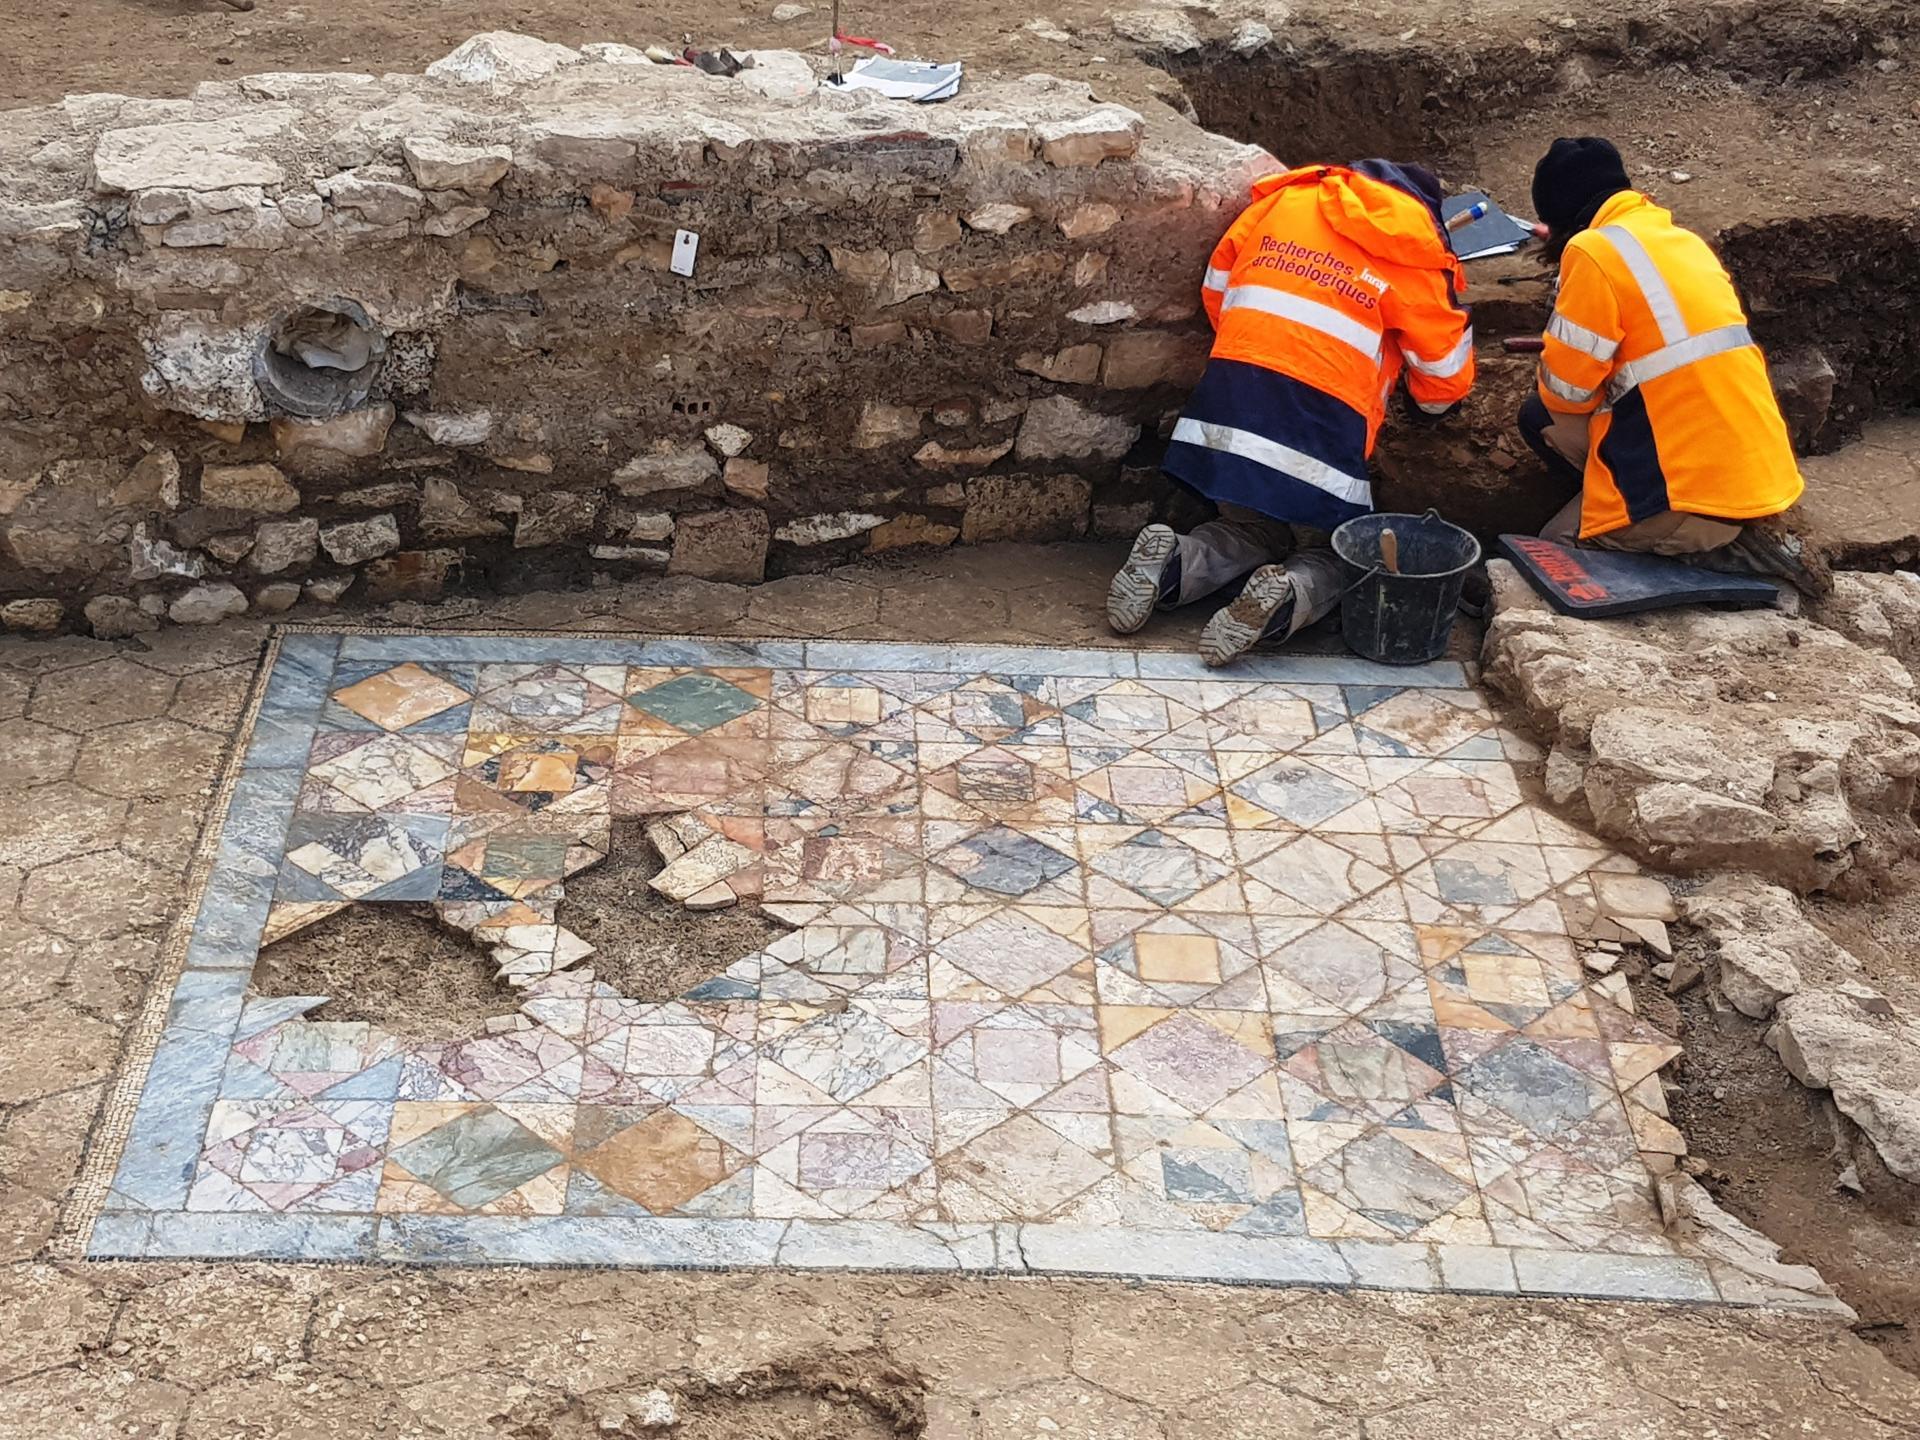 Francia, importante scoperta archeologica a Nîmes: trovate due ricche domus romane